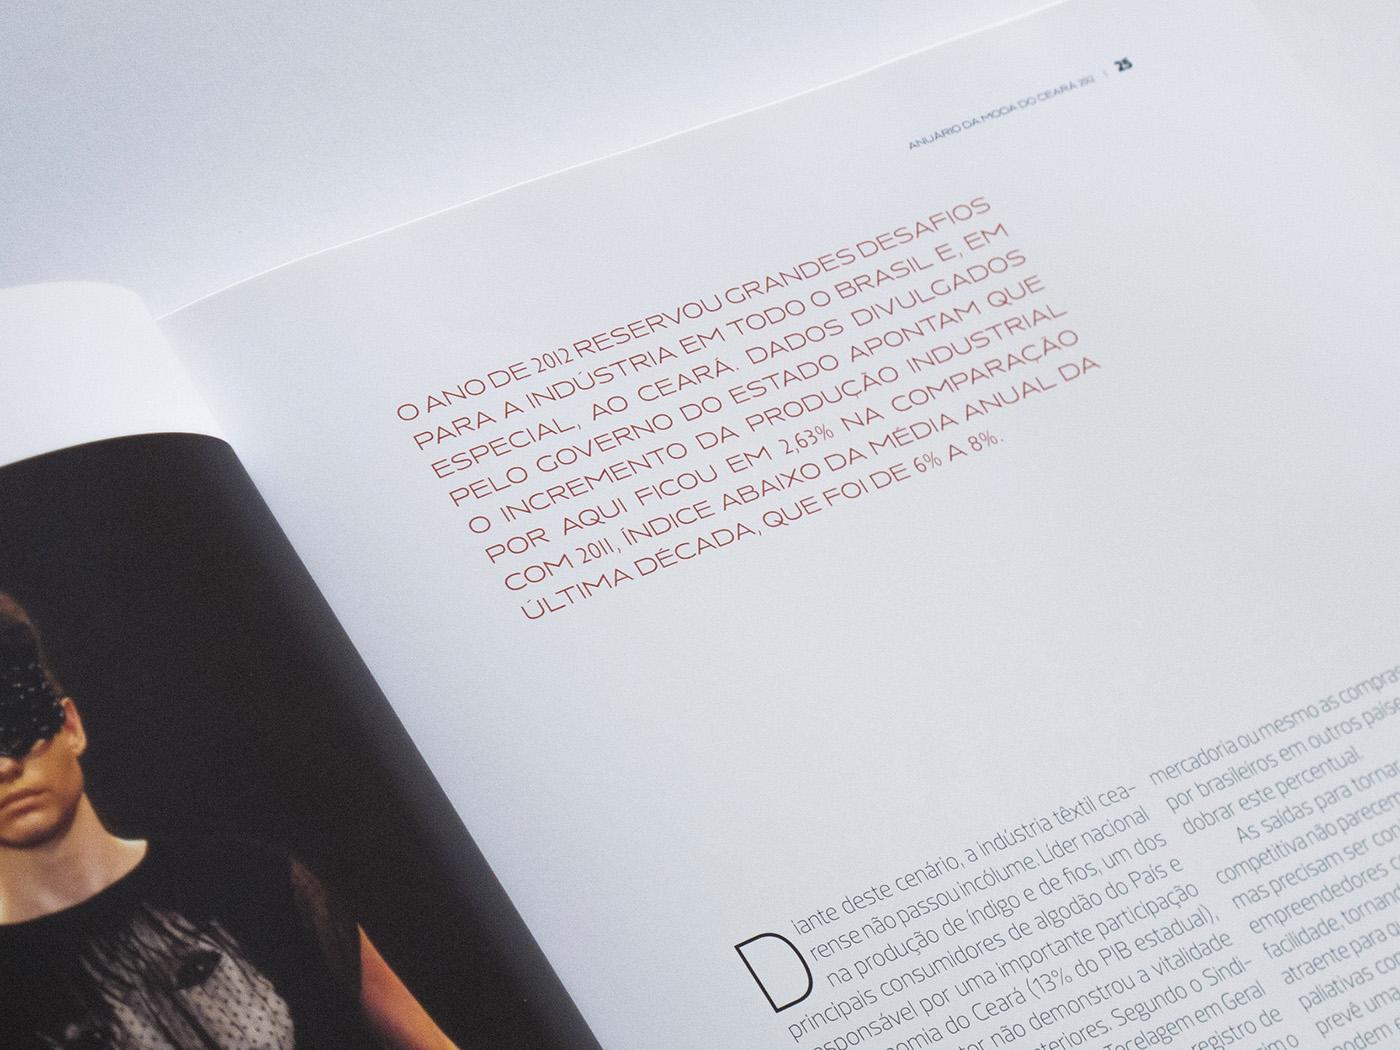 Adobe Portfolio book moda report yearbook Livro ceará fortaleza spreadsheet graph ANNUAL